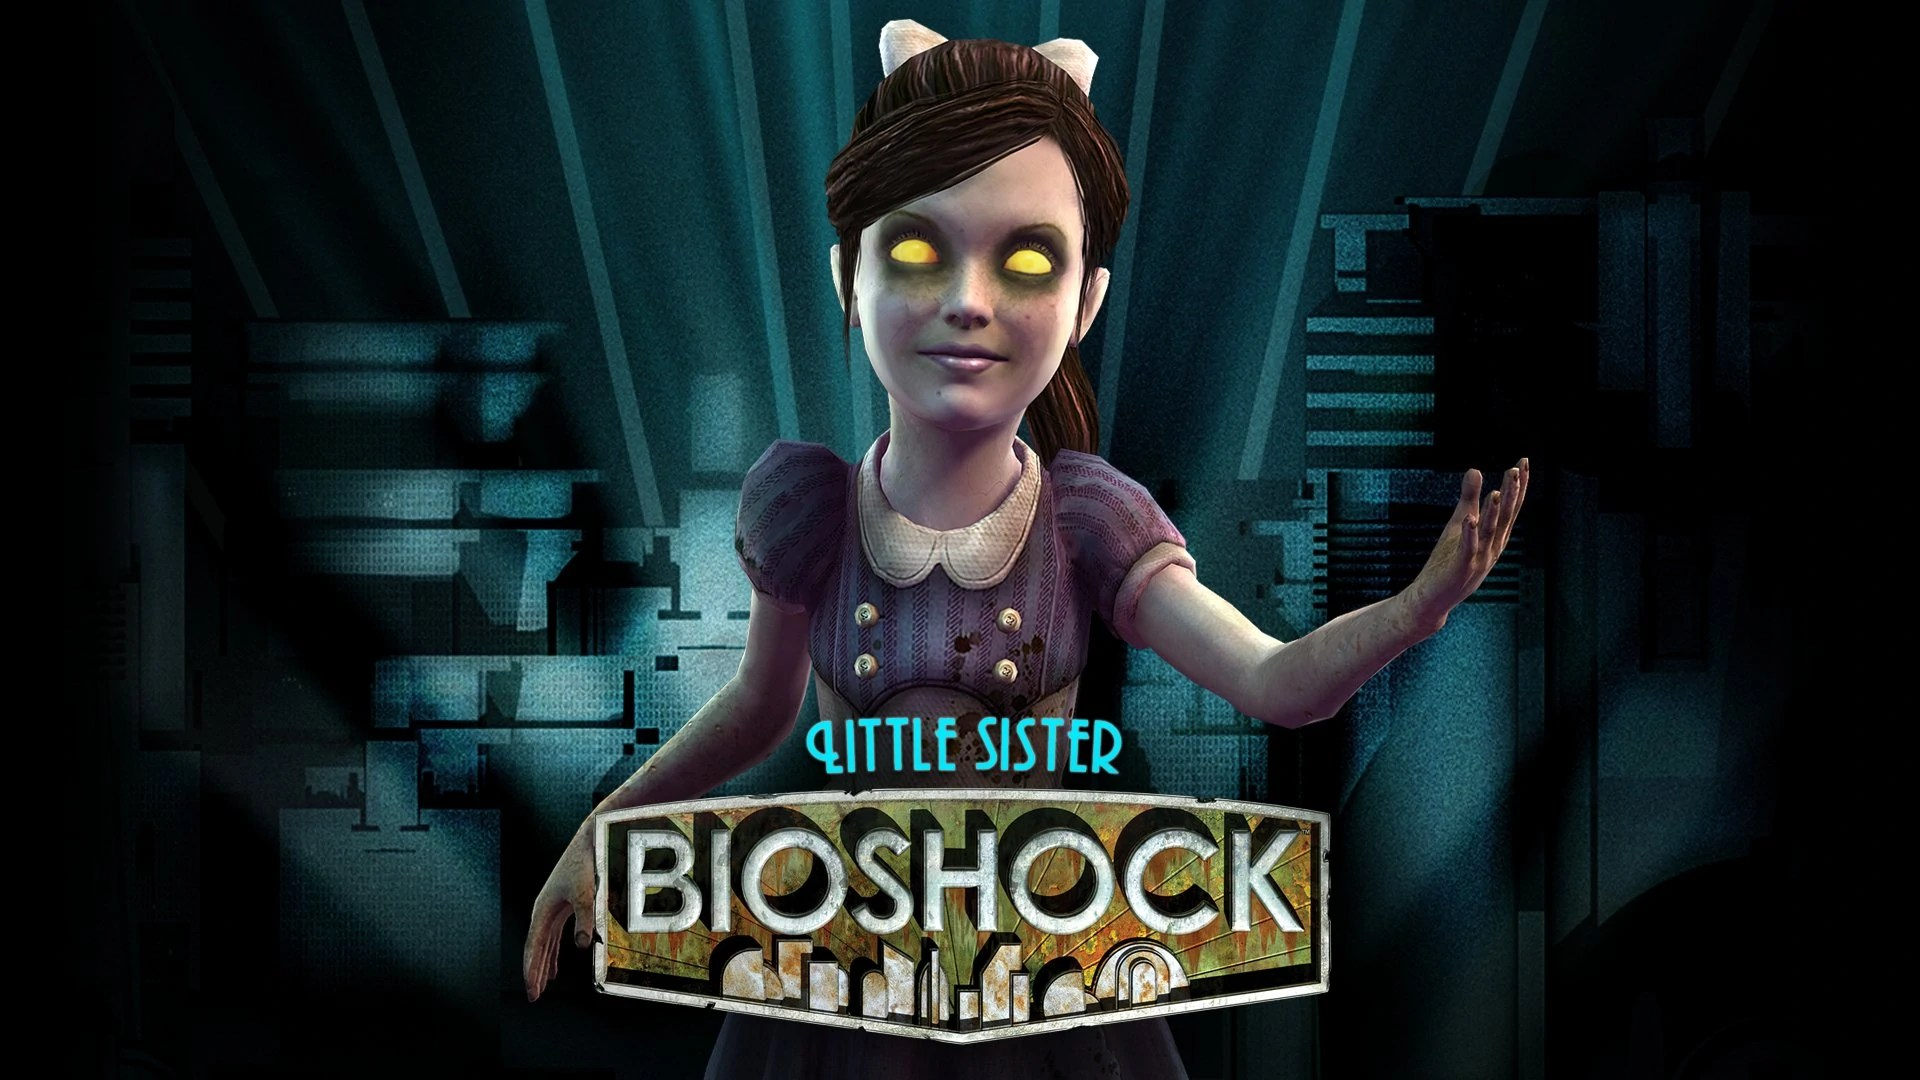 G Shock Hd Wallpaper Bioshock Remastered Little Sister Steam Trading Cards